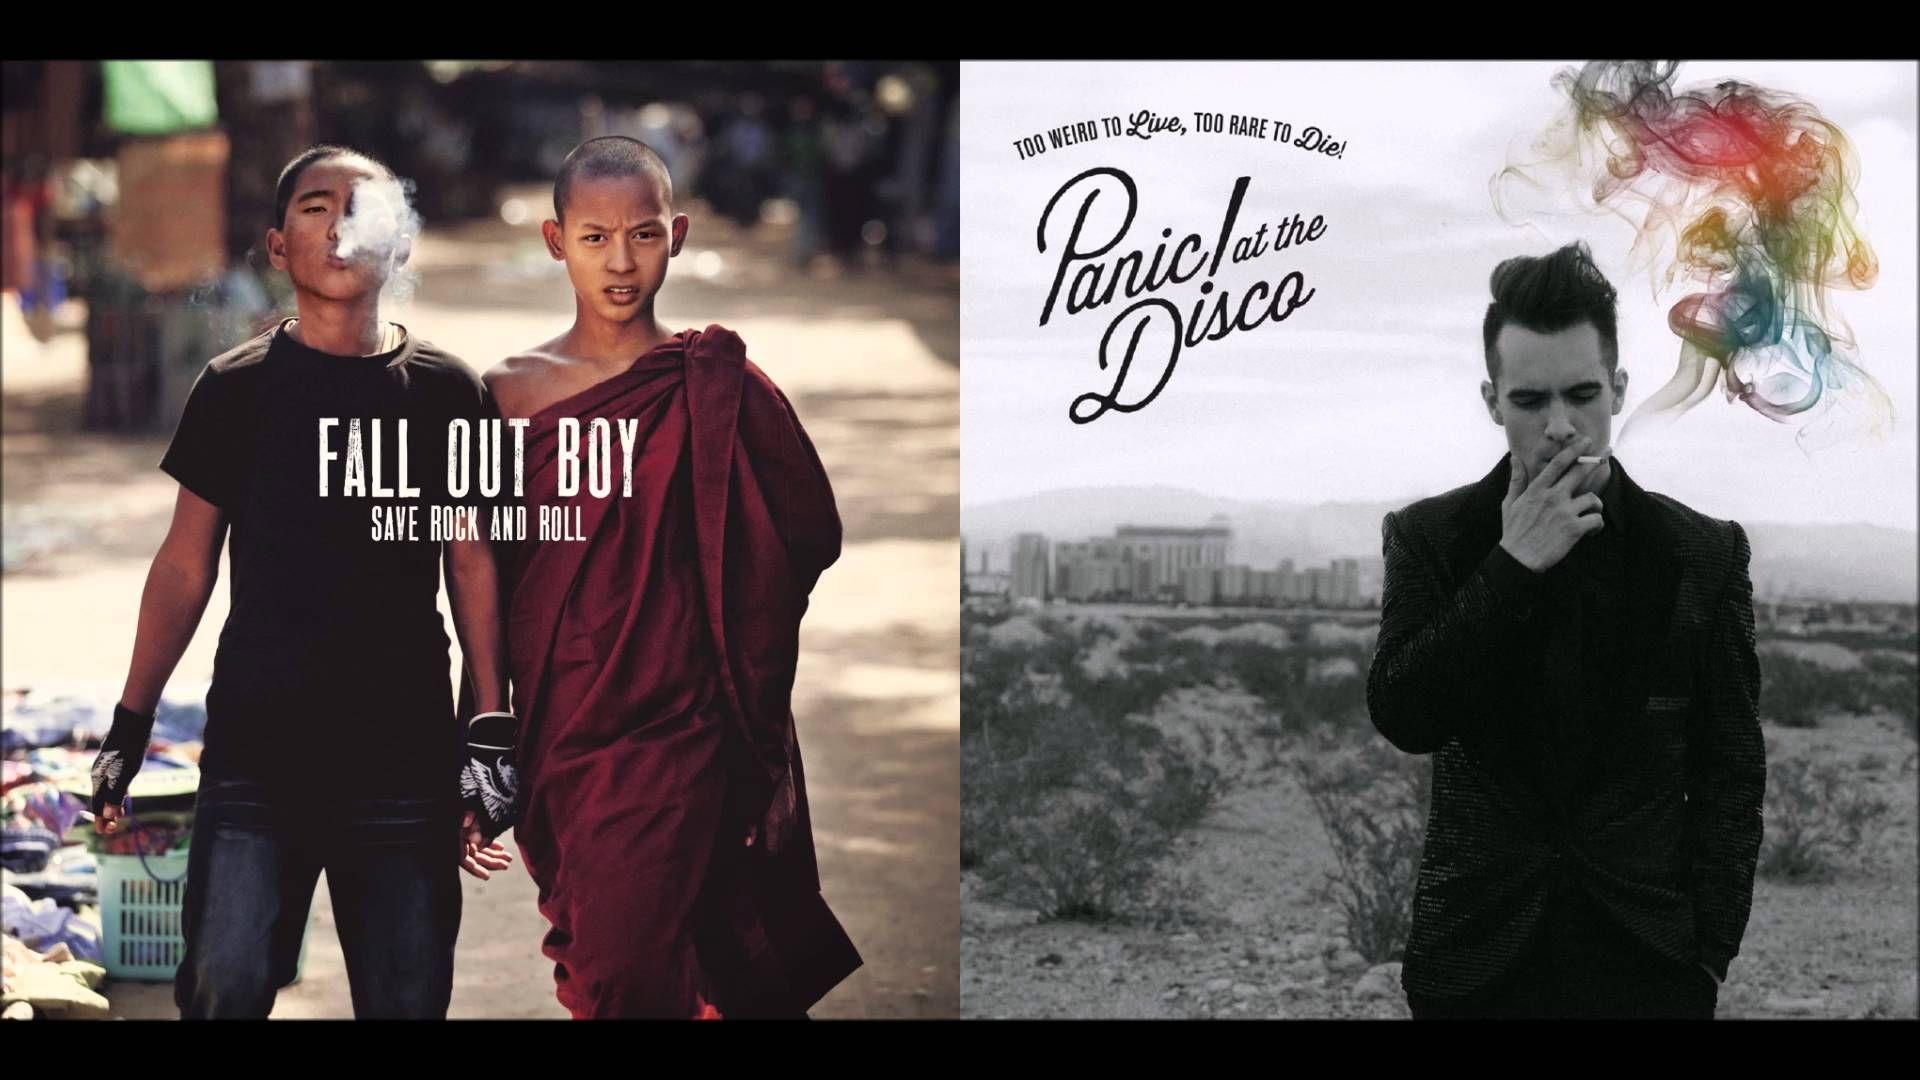 3ad6078a0e99b Young Gospel - Panic! At The Disco vs. Fall Out Boy (Mashup ...